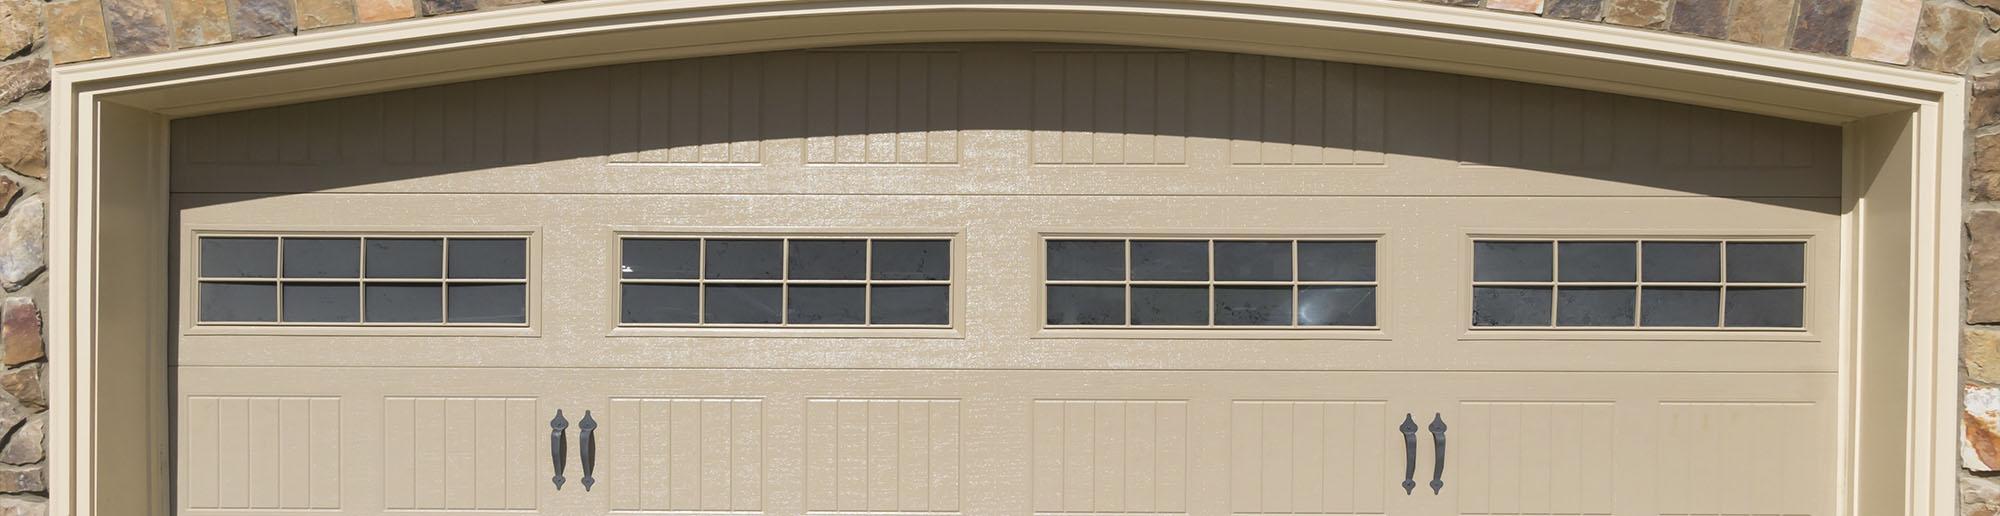 Garage door repair boise eagle star emmett meridian nampa caldwell garage door repair boise eagle star emmett meridian nampa caldwell kuna id rubansaba